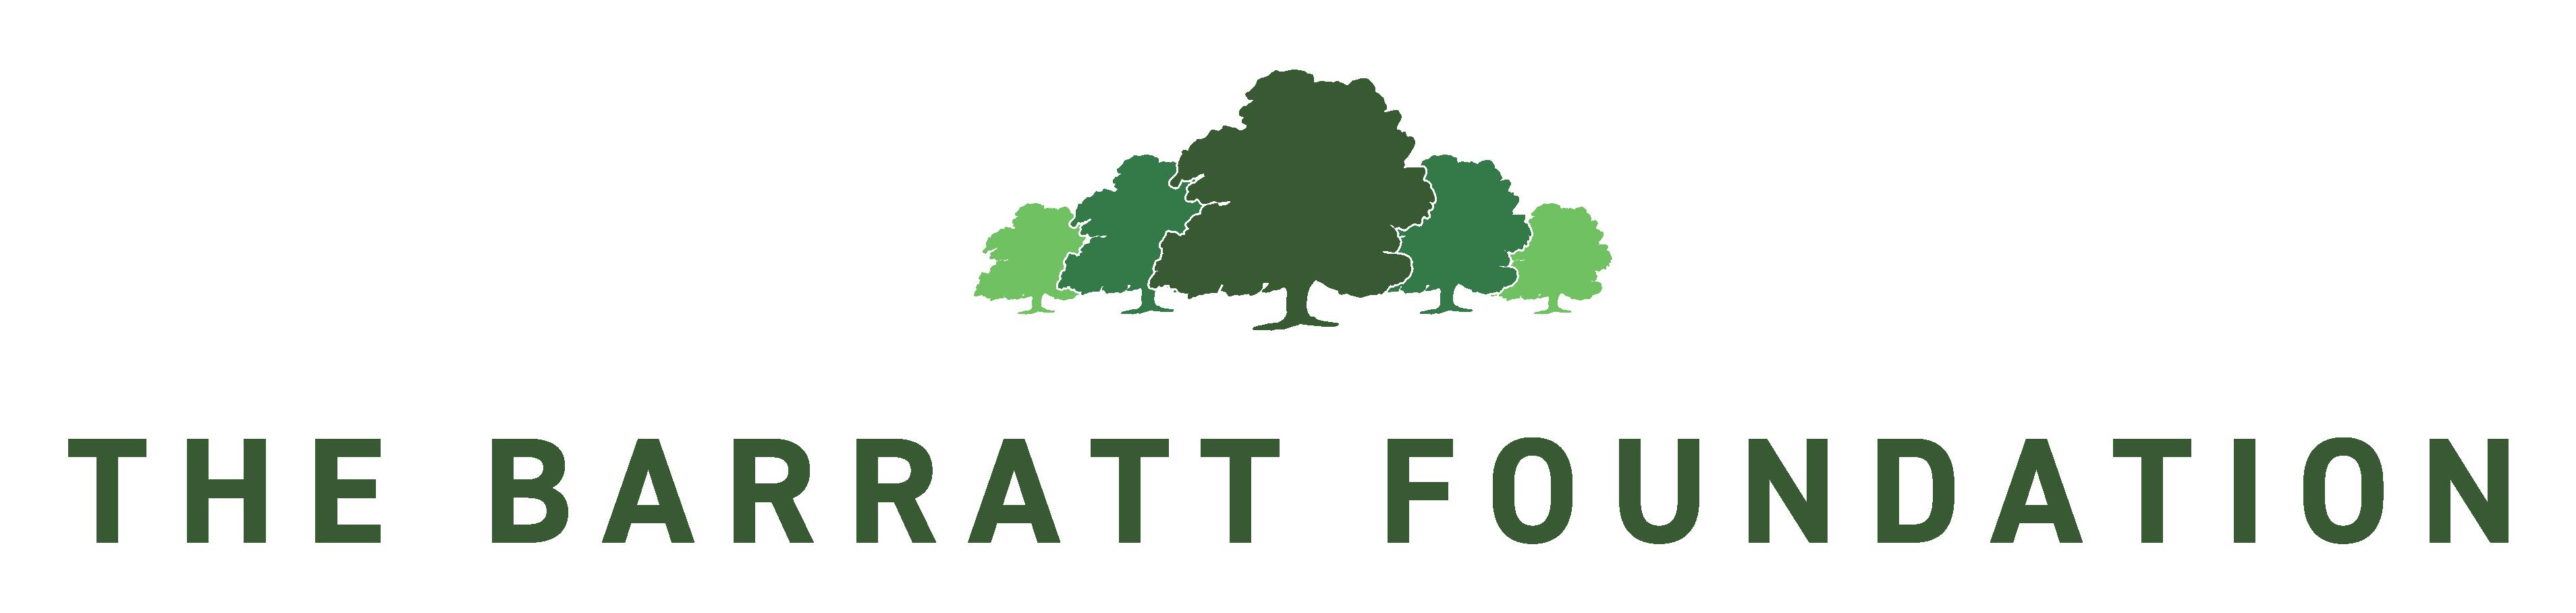 The Barratt Foundation